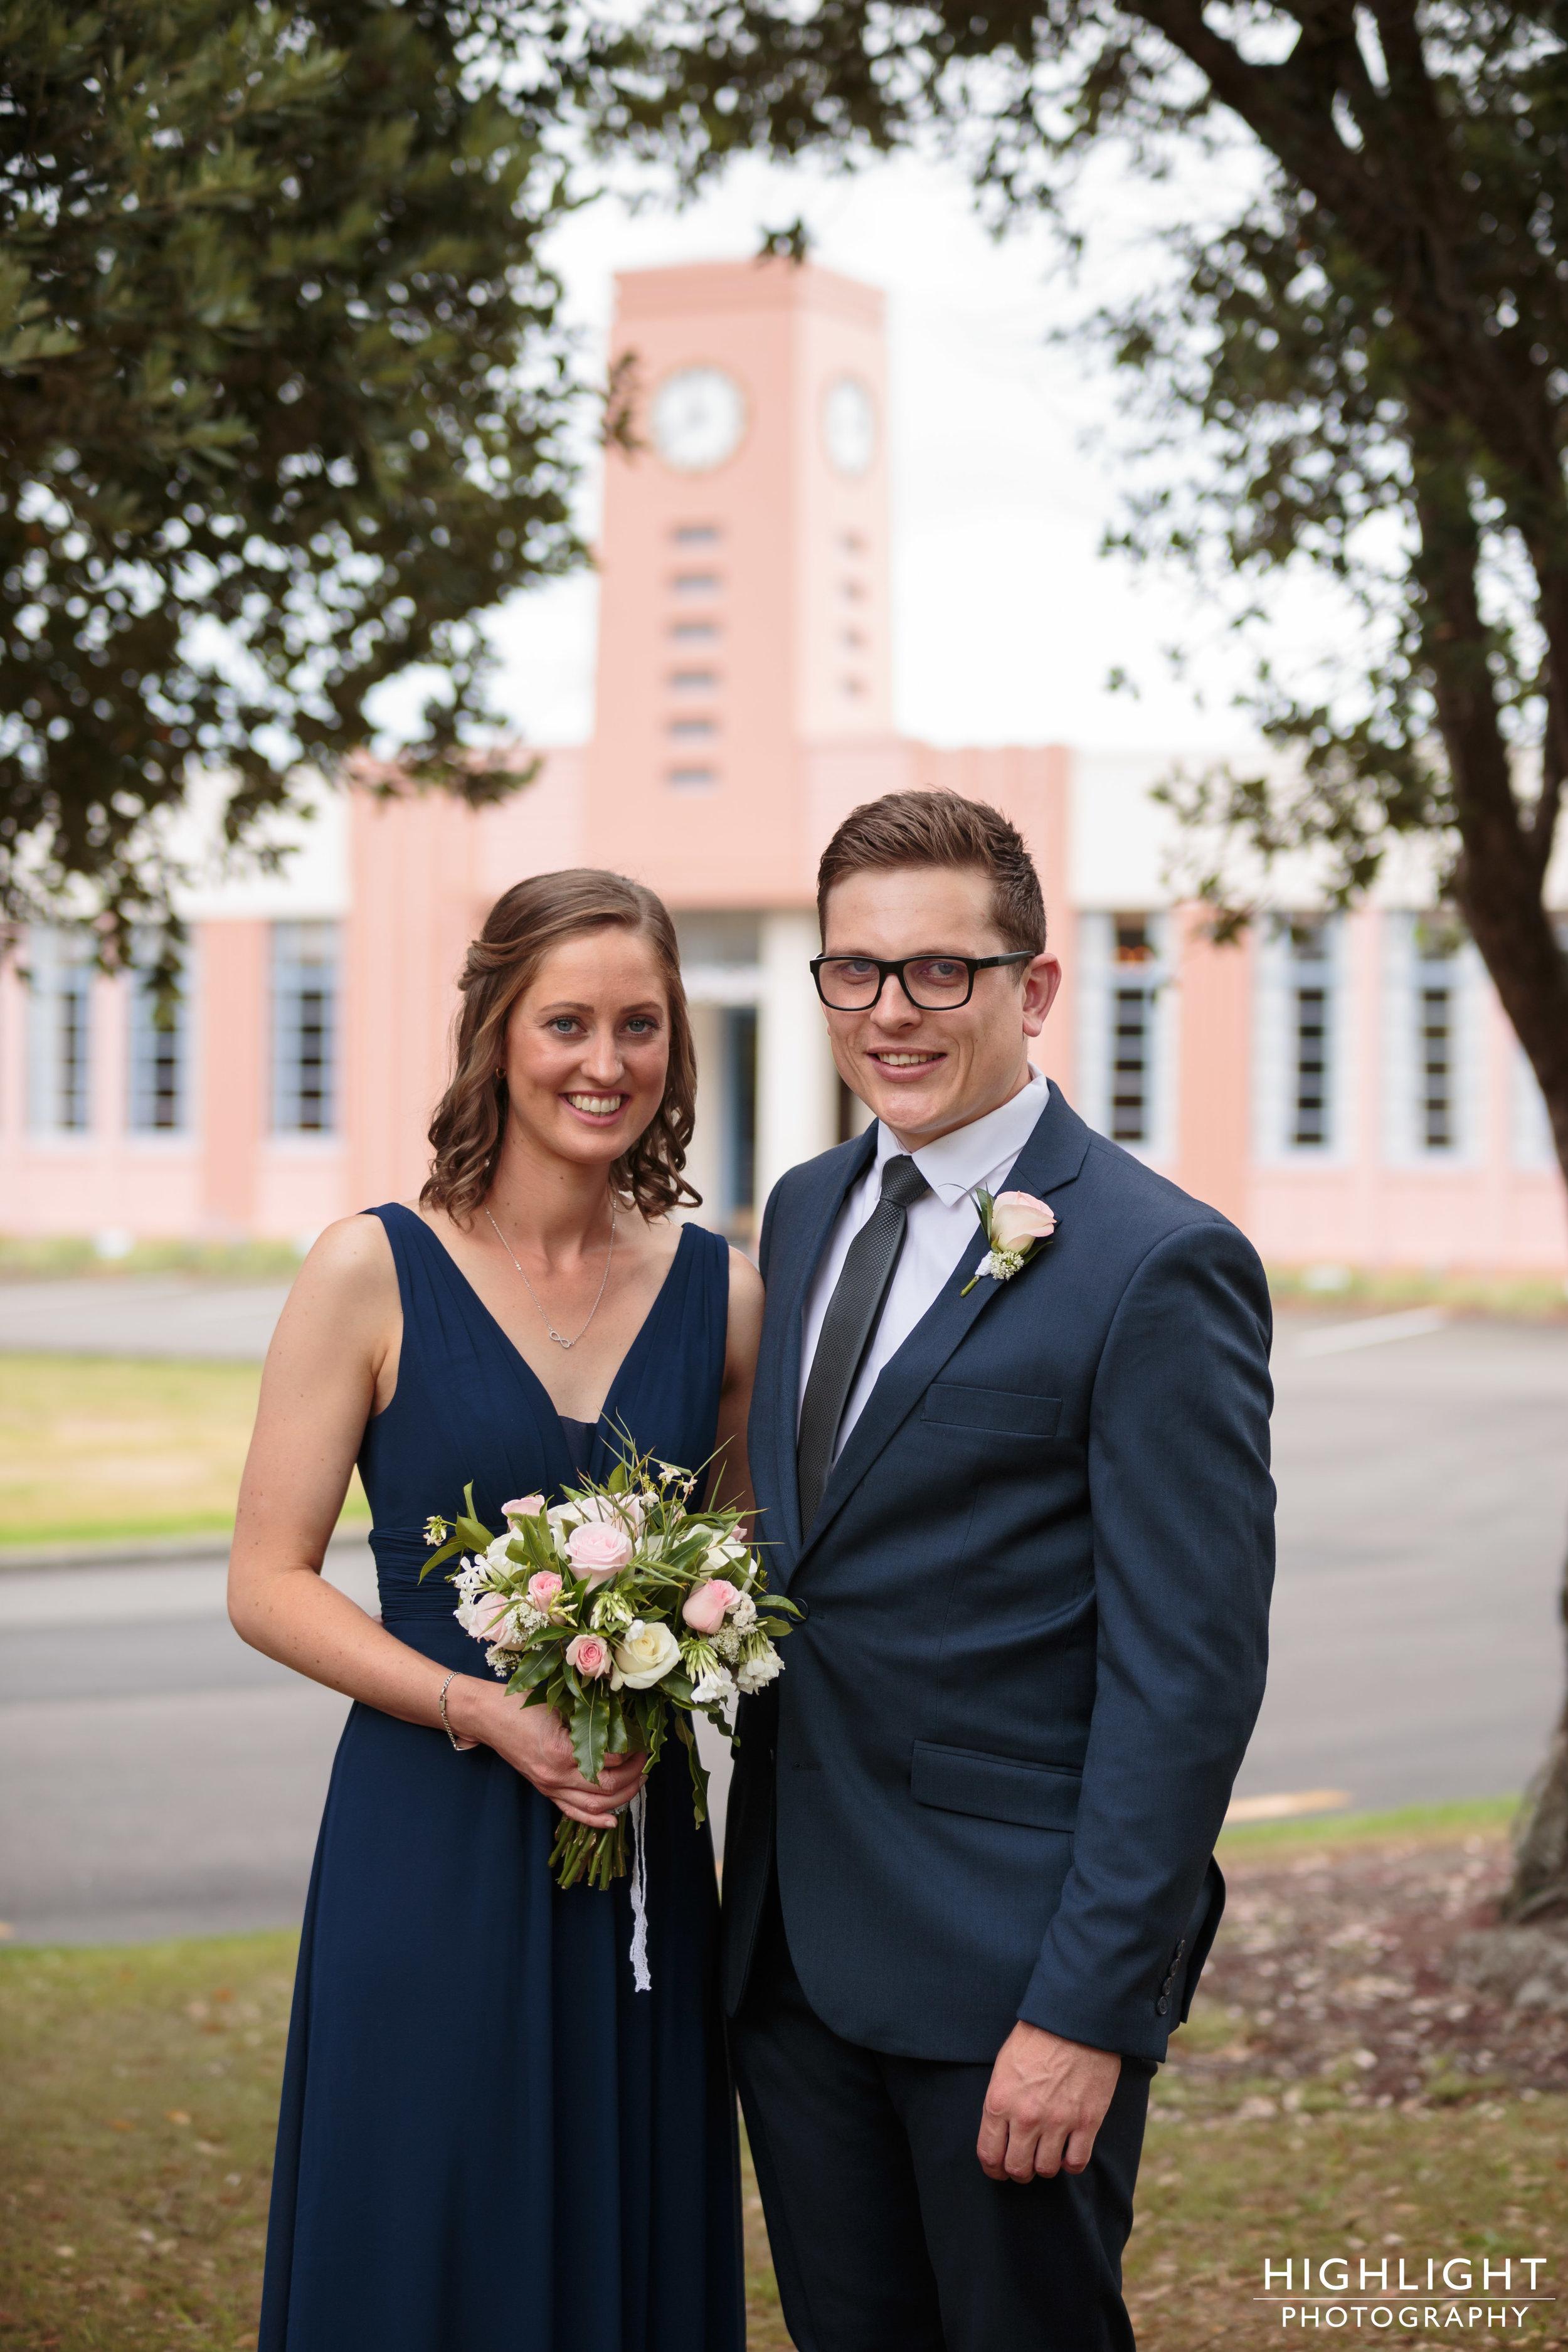 JM-2017-Highlight-wedding-photography-palmerston-north-new-zealand-102.jpg